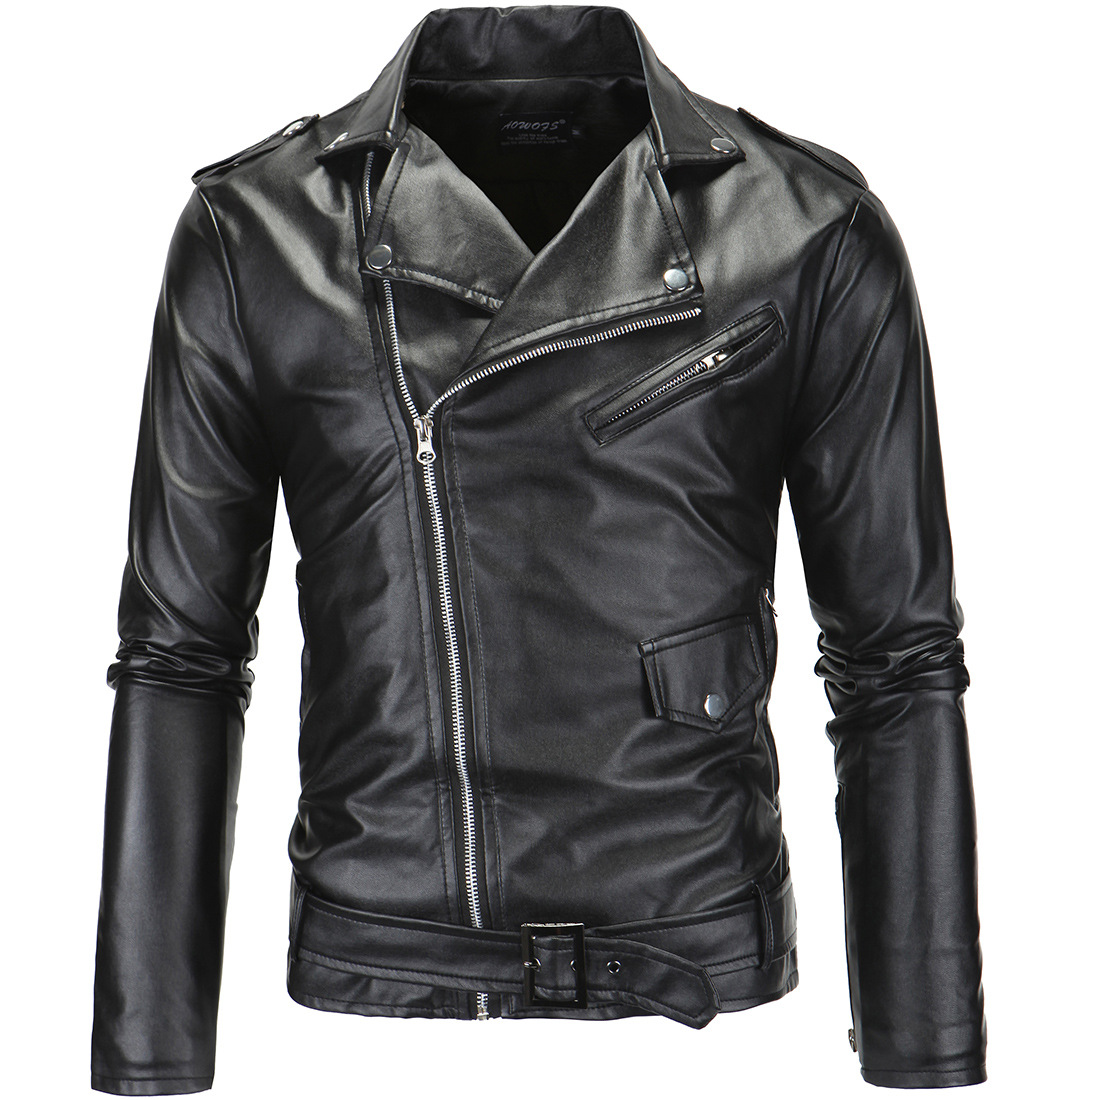 Neue Kommen Marke Motorrad Leder Jacke Männer Männer Leder Jacke Jaqueta De Couro Masculina Herren Leder Jacken Mäntel Dauerhafte Modellierung